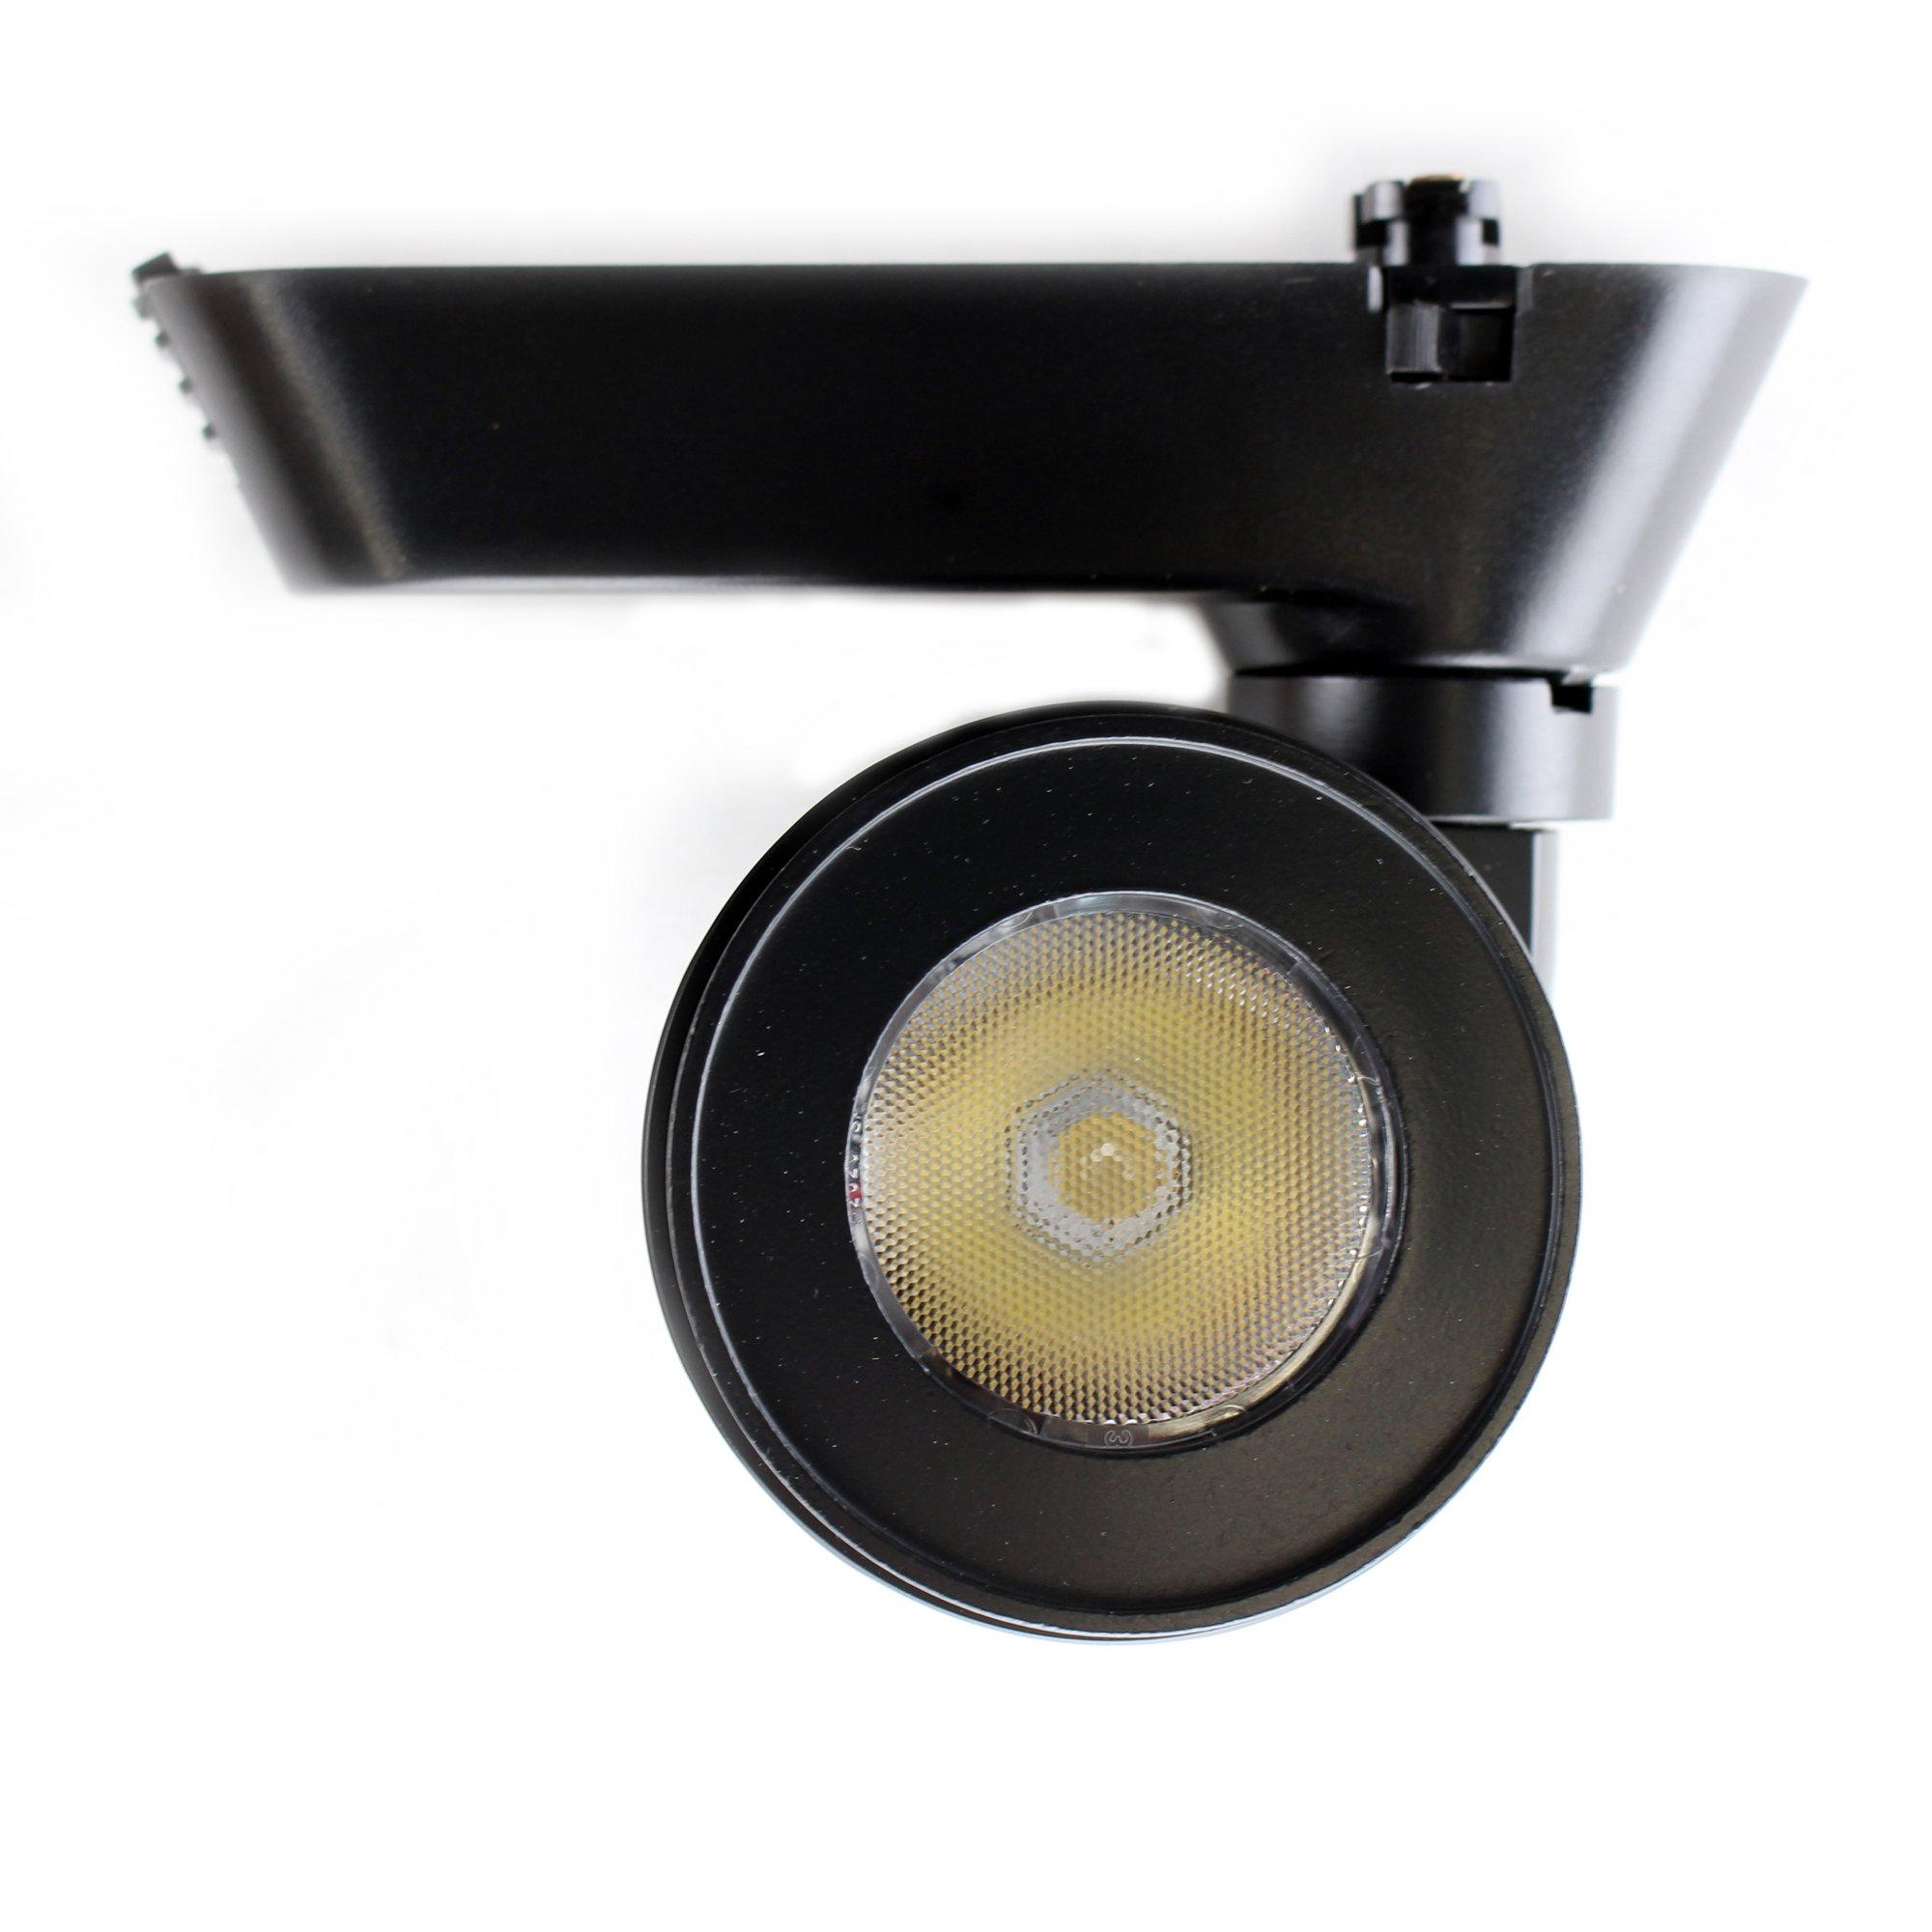 Juno Lighting T252L-3K-HC-S-BL 18W Cylindra LED Track Head, 3000K, Spot, Black by Juno Lighting